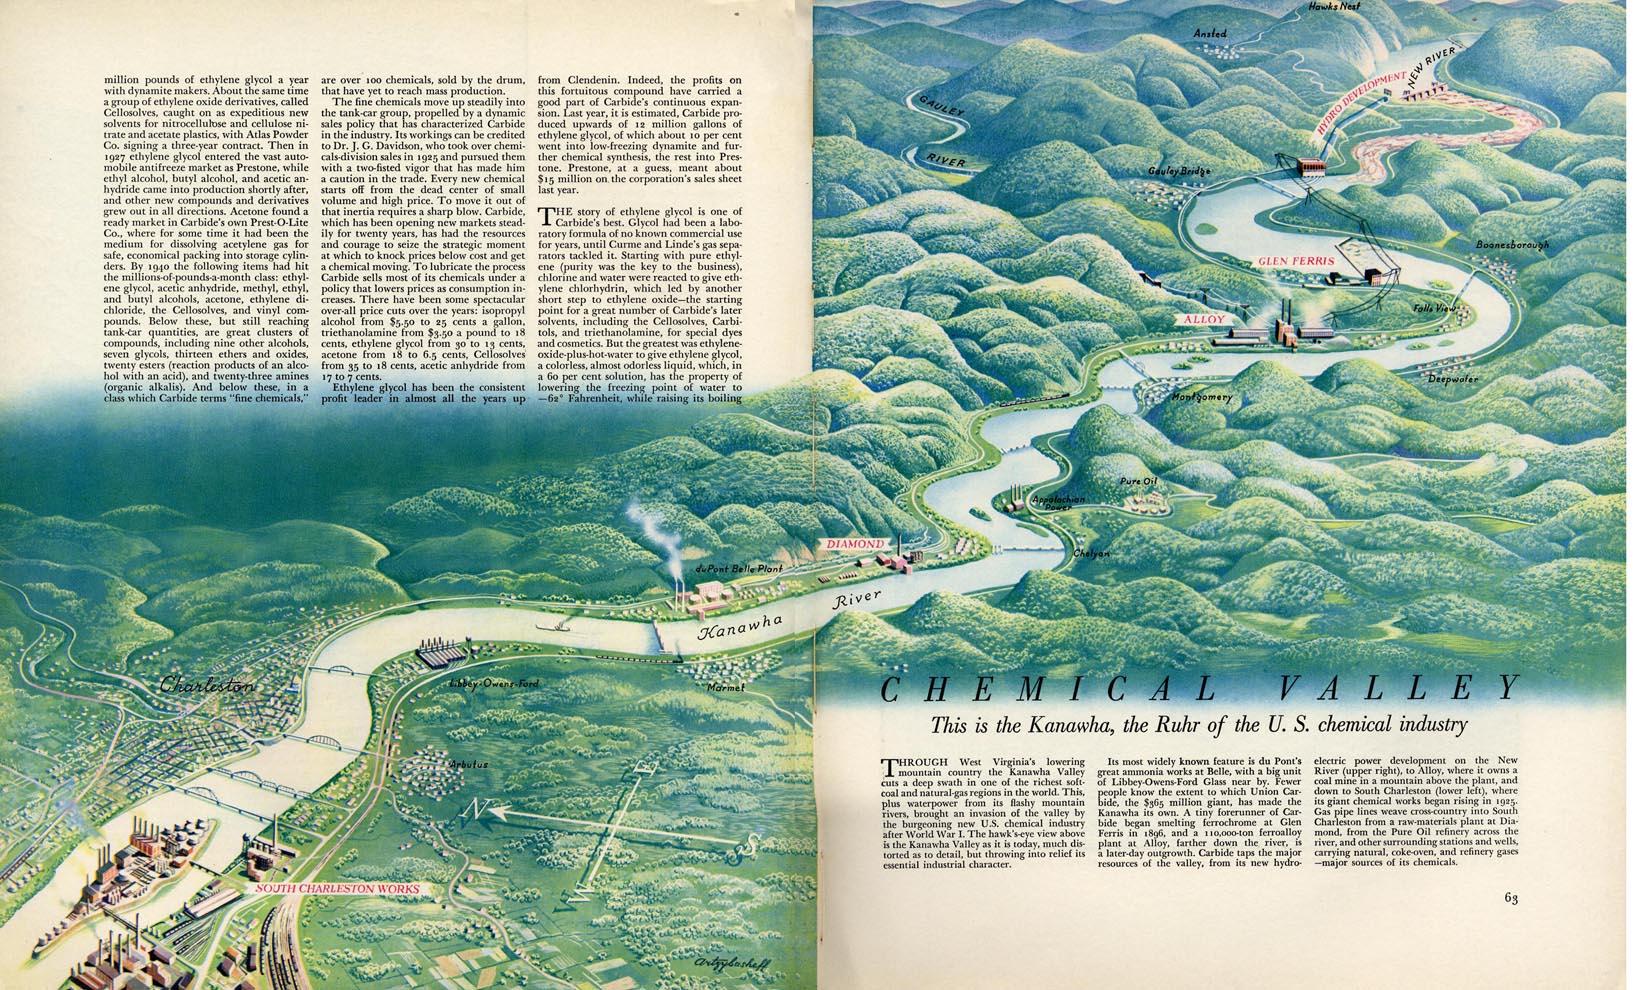 1941_Sept_Fortune_Chemical_Valley.jpg